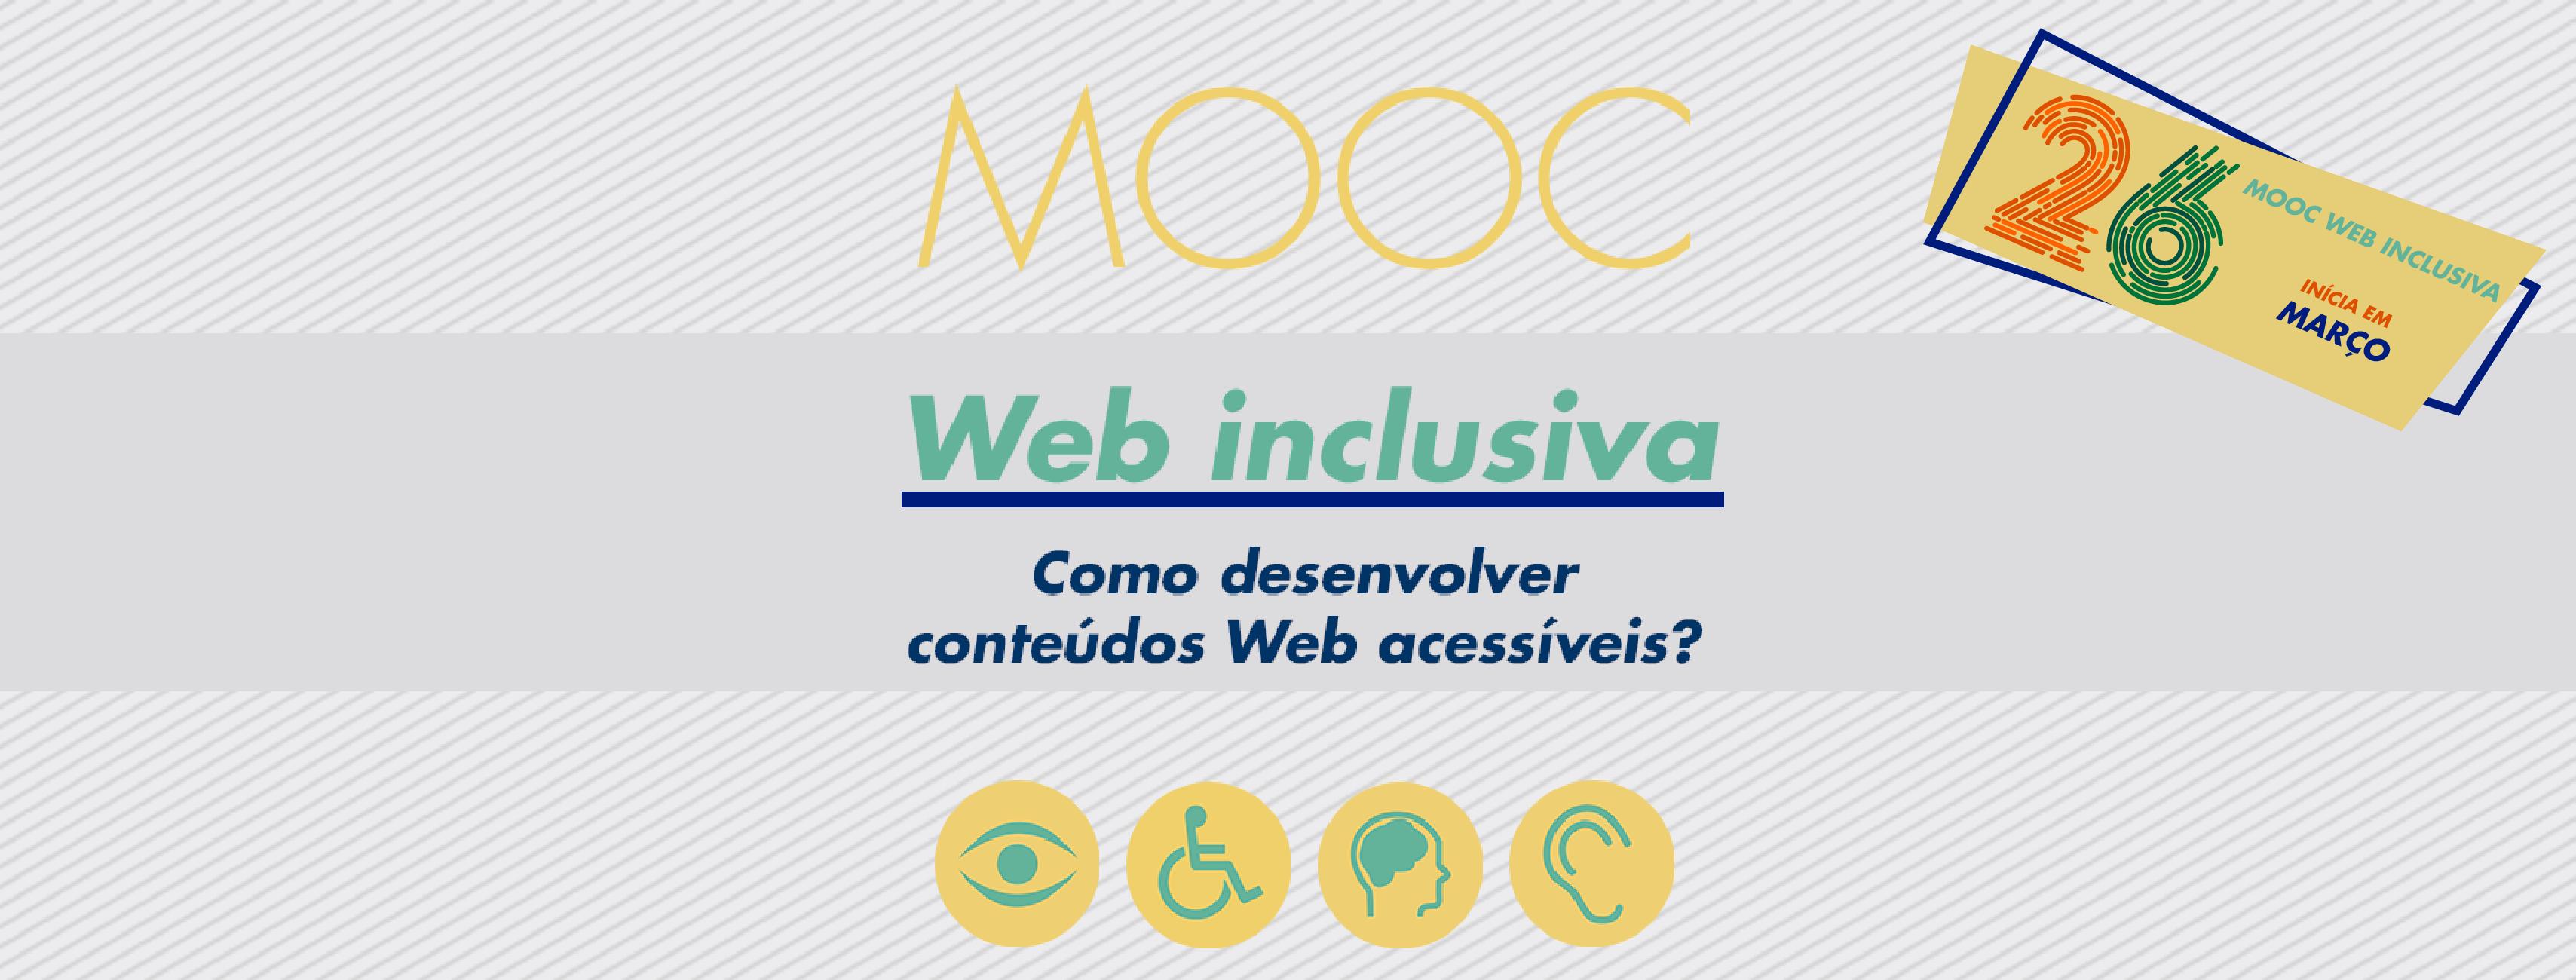 mooc_web_inclusiva